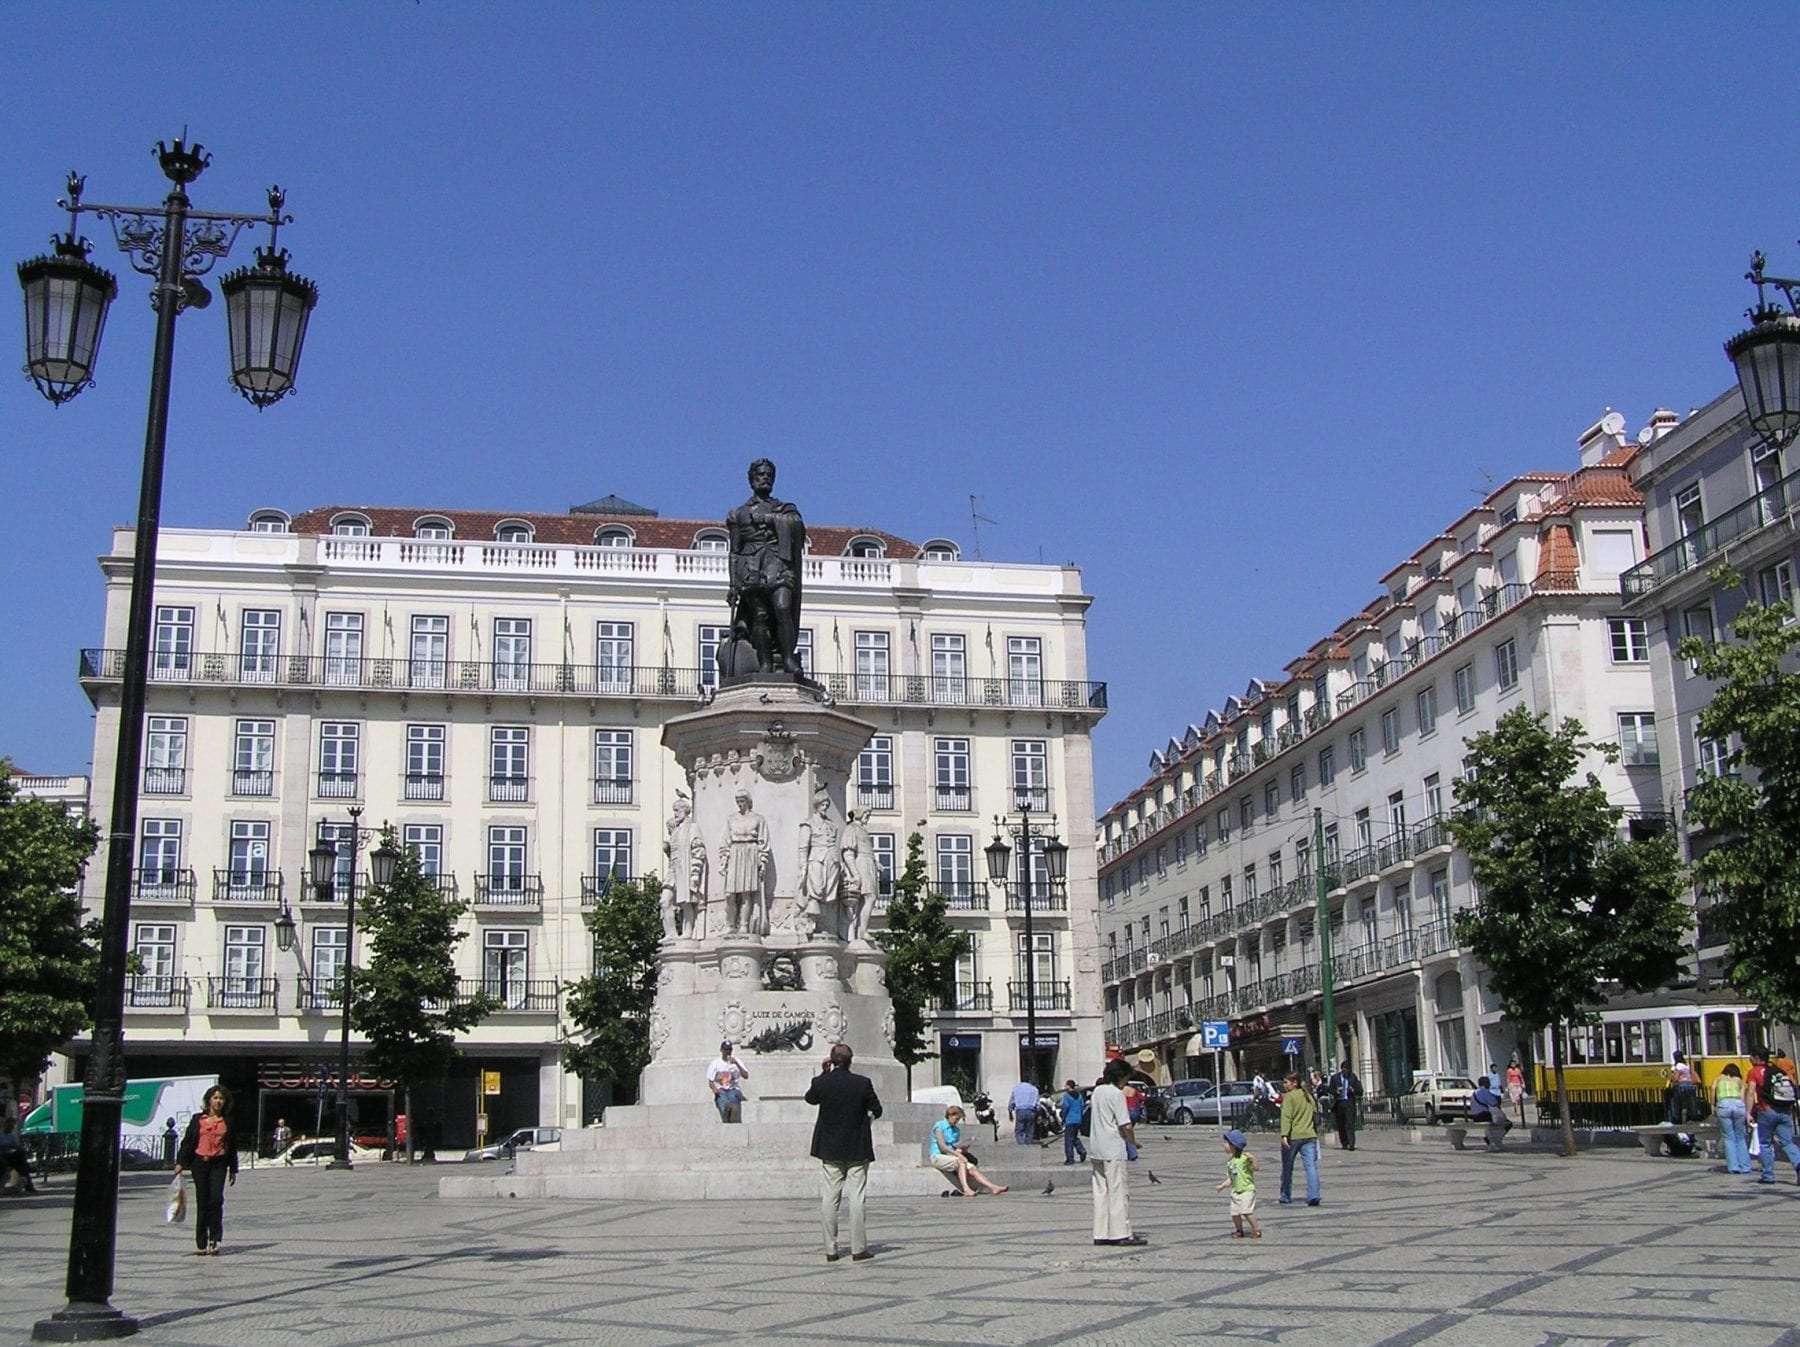 Lisboa, la ciudad que nació de un terremoto